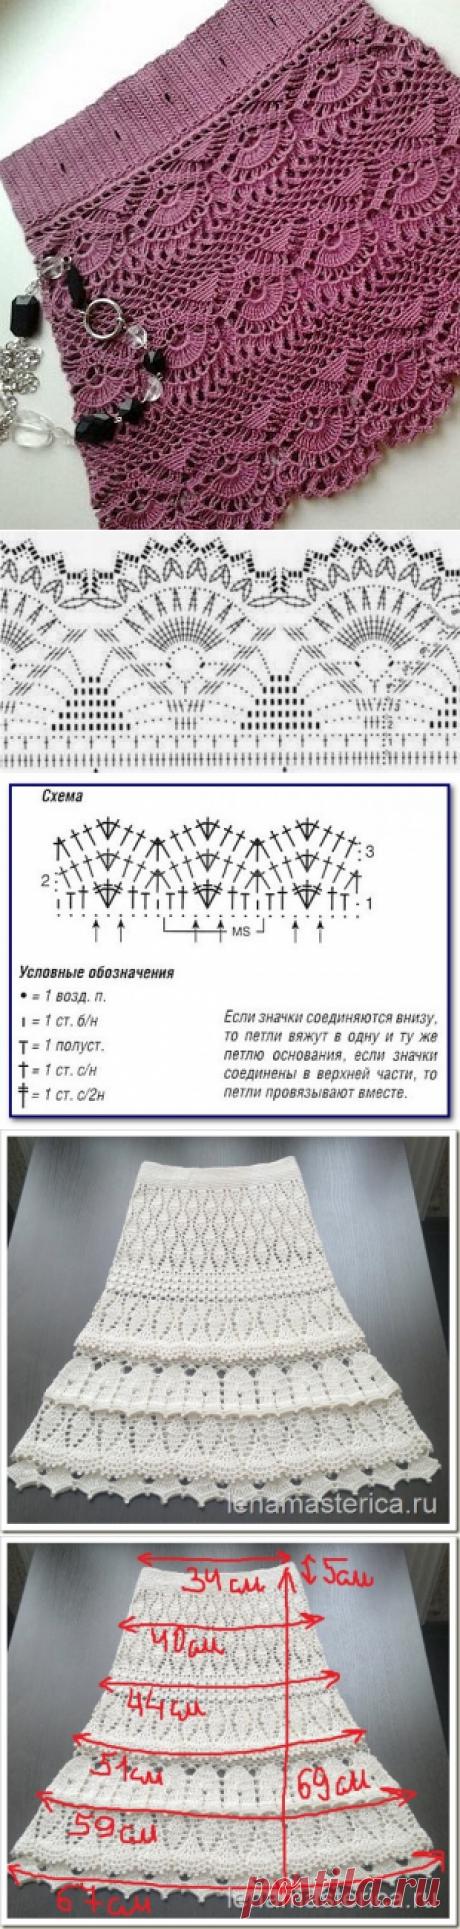 "Подборка - 13а""Копилочка для вязальщицы""/234 фото/"